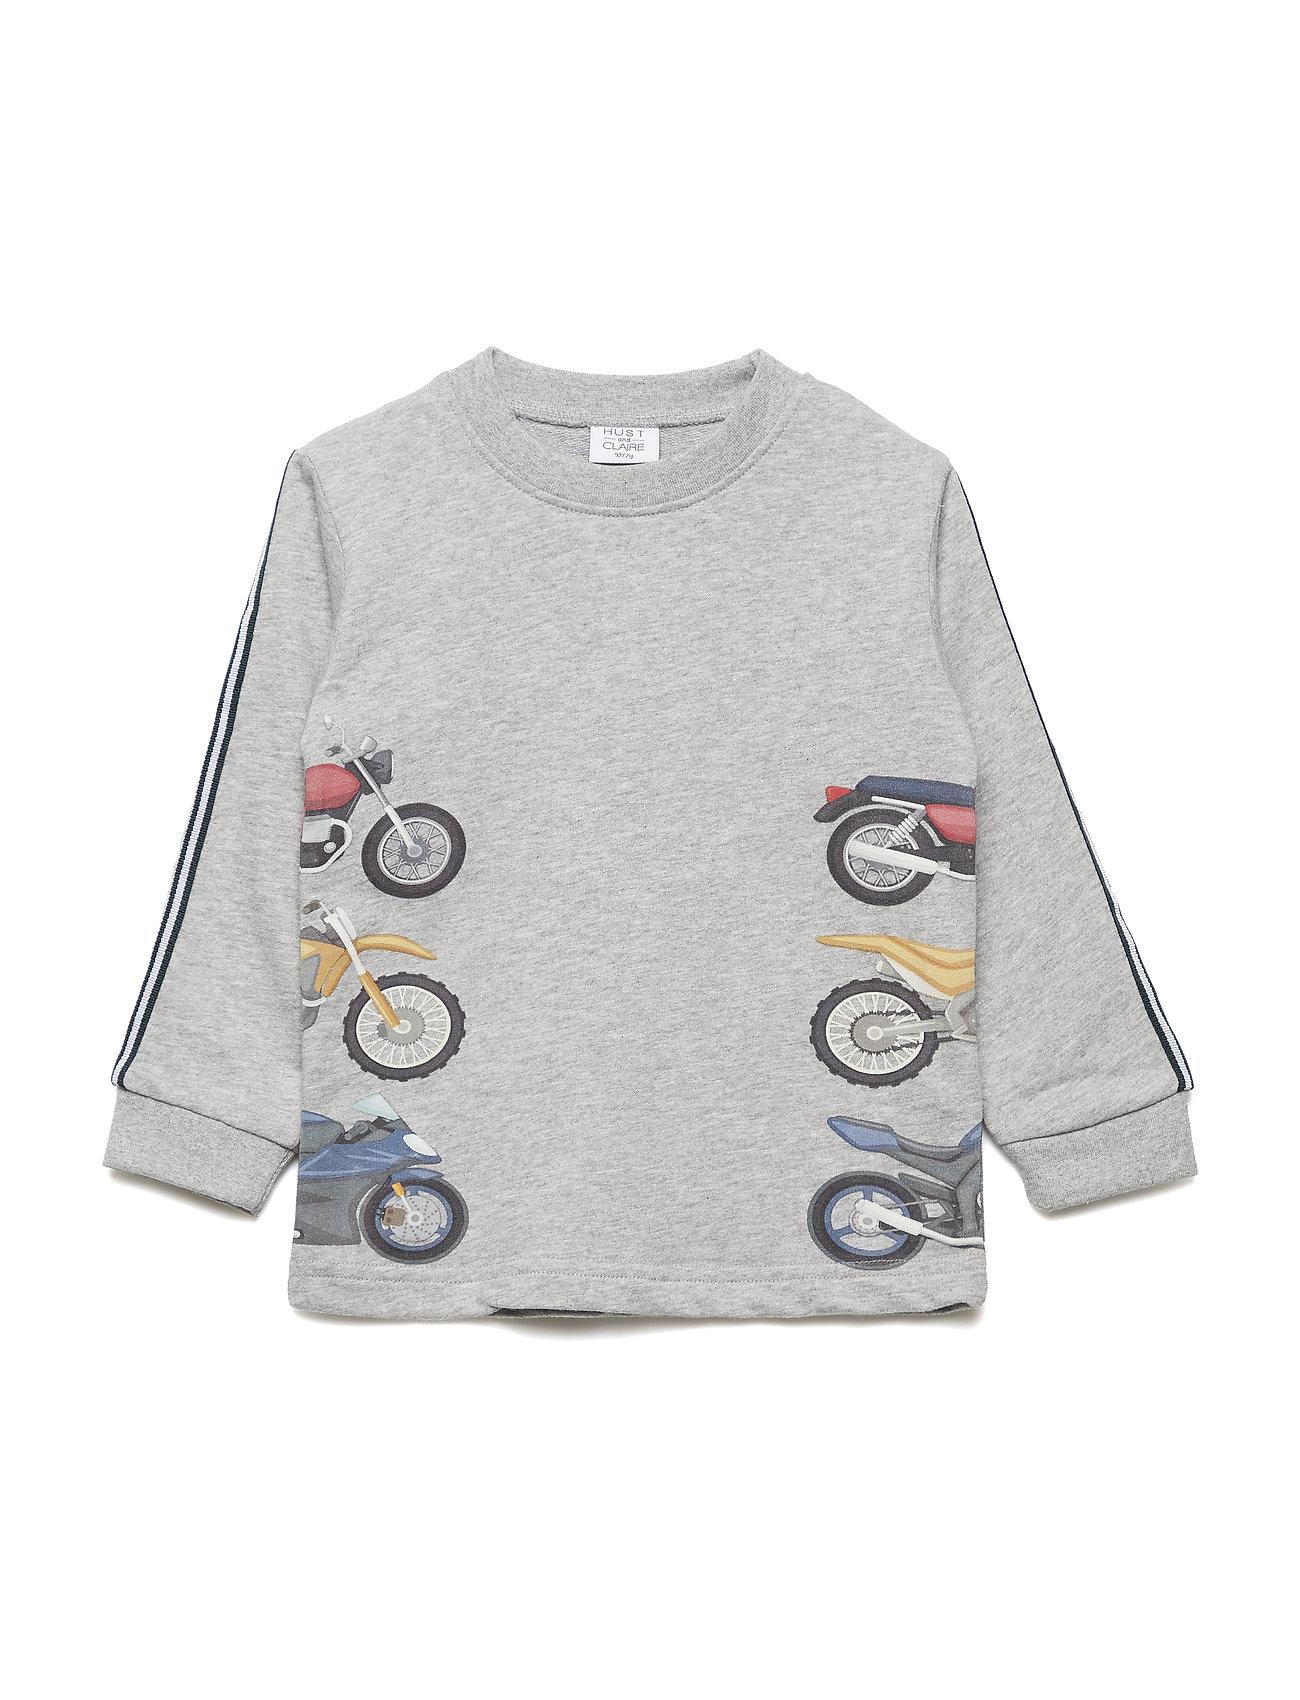 Hust & Claire Asger - T-shirt L/S